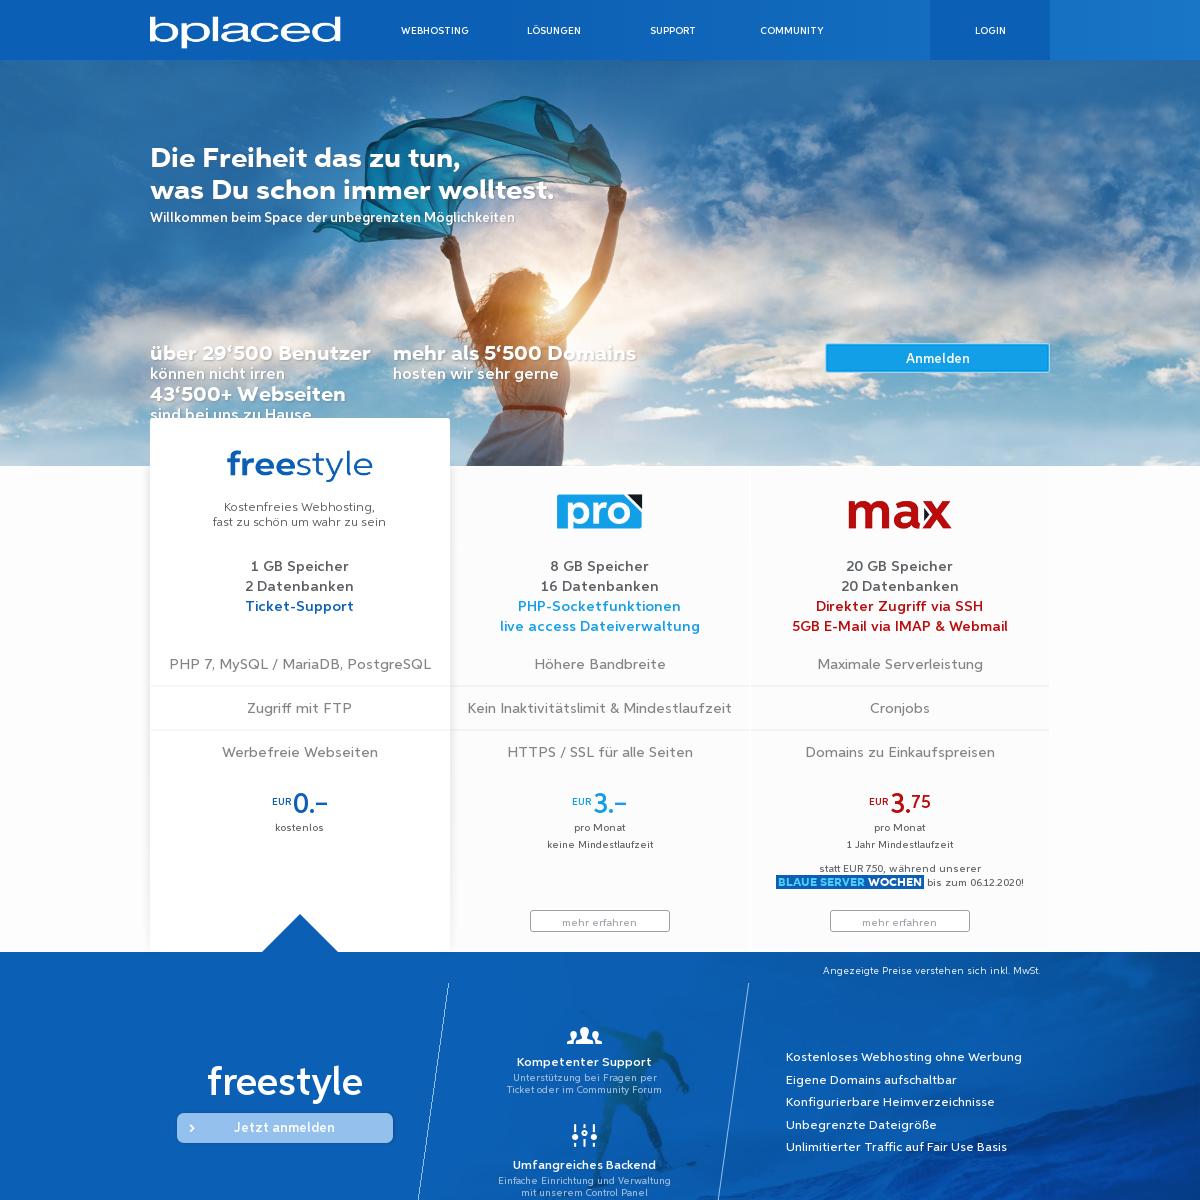 bplaced - SSD-NVMe Webspace & Webhosting